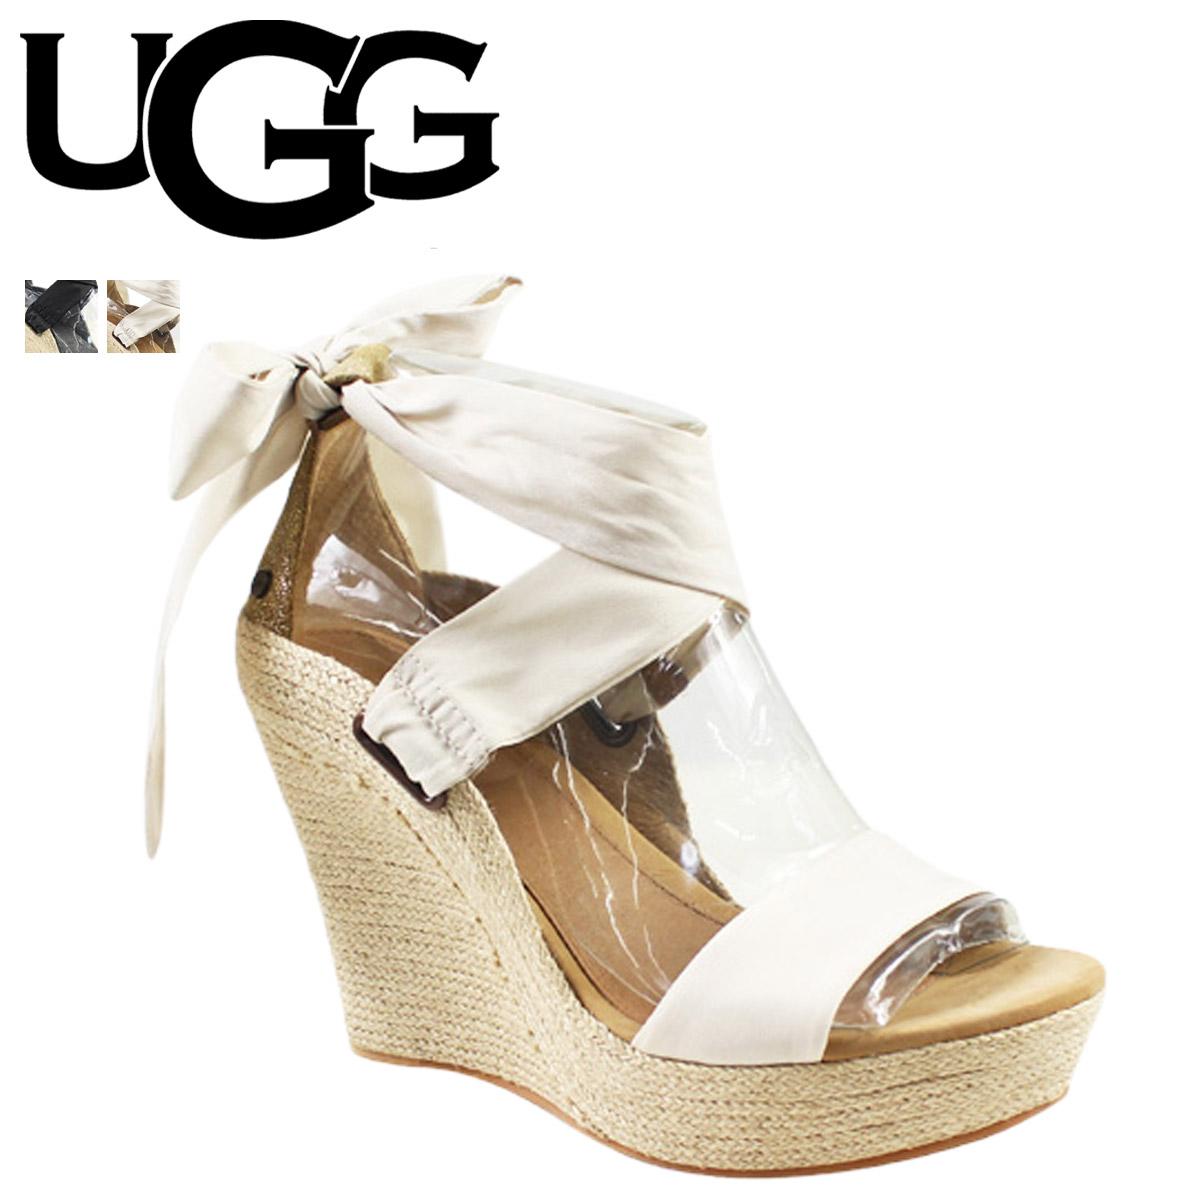 UGG アグ サンダル ウェッジサンダル ジュール WOMENS JULES 1008353 1008354 レザー ジュート レディース